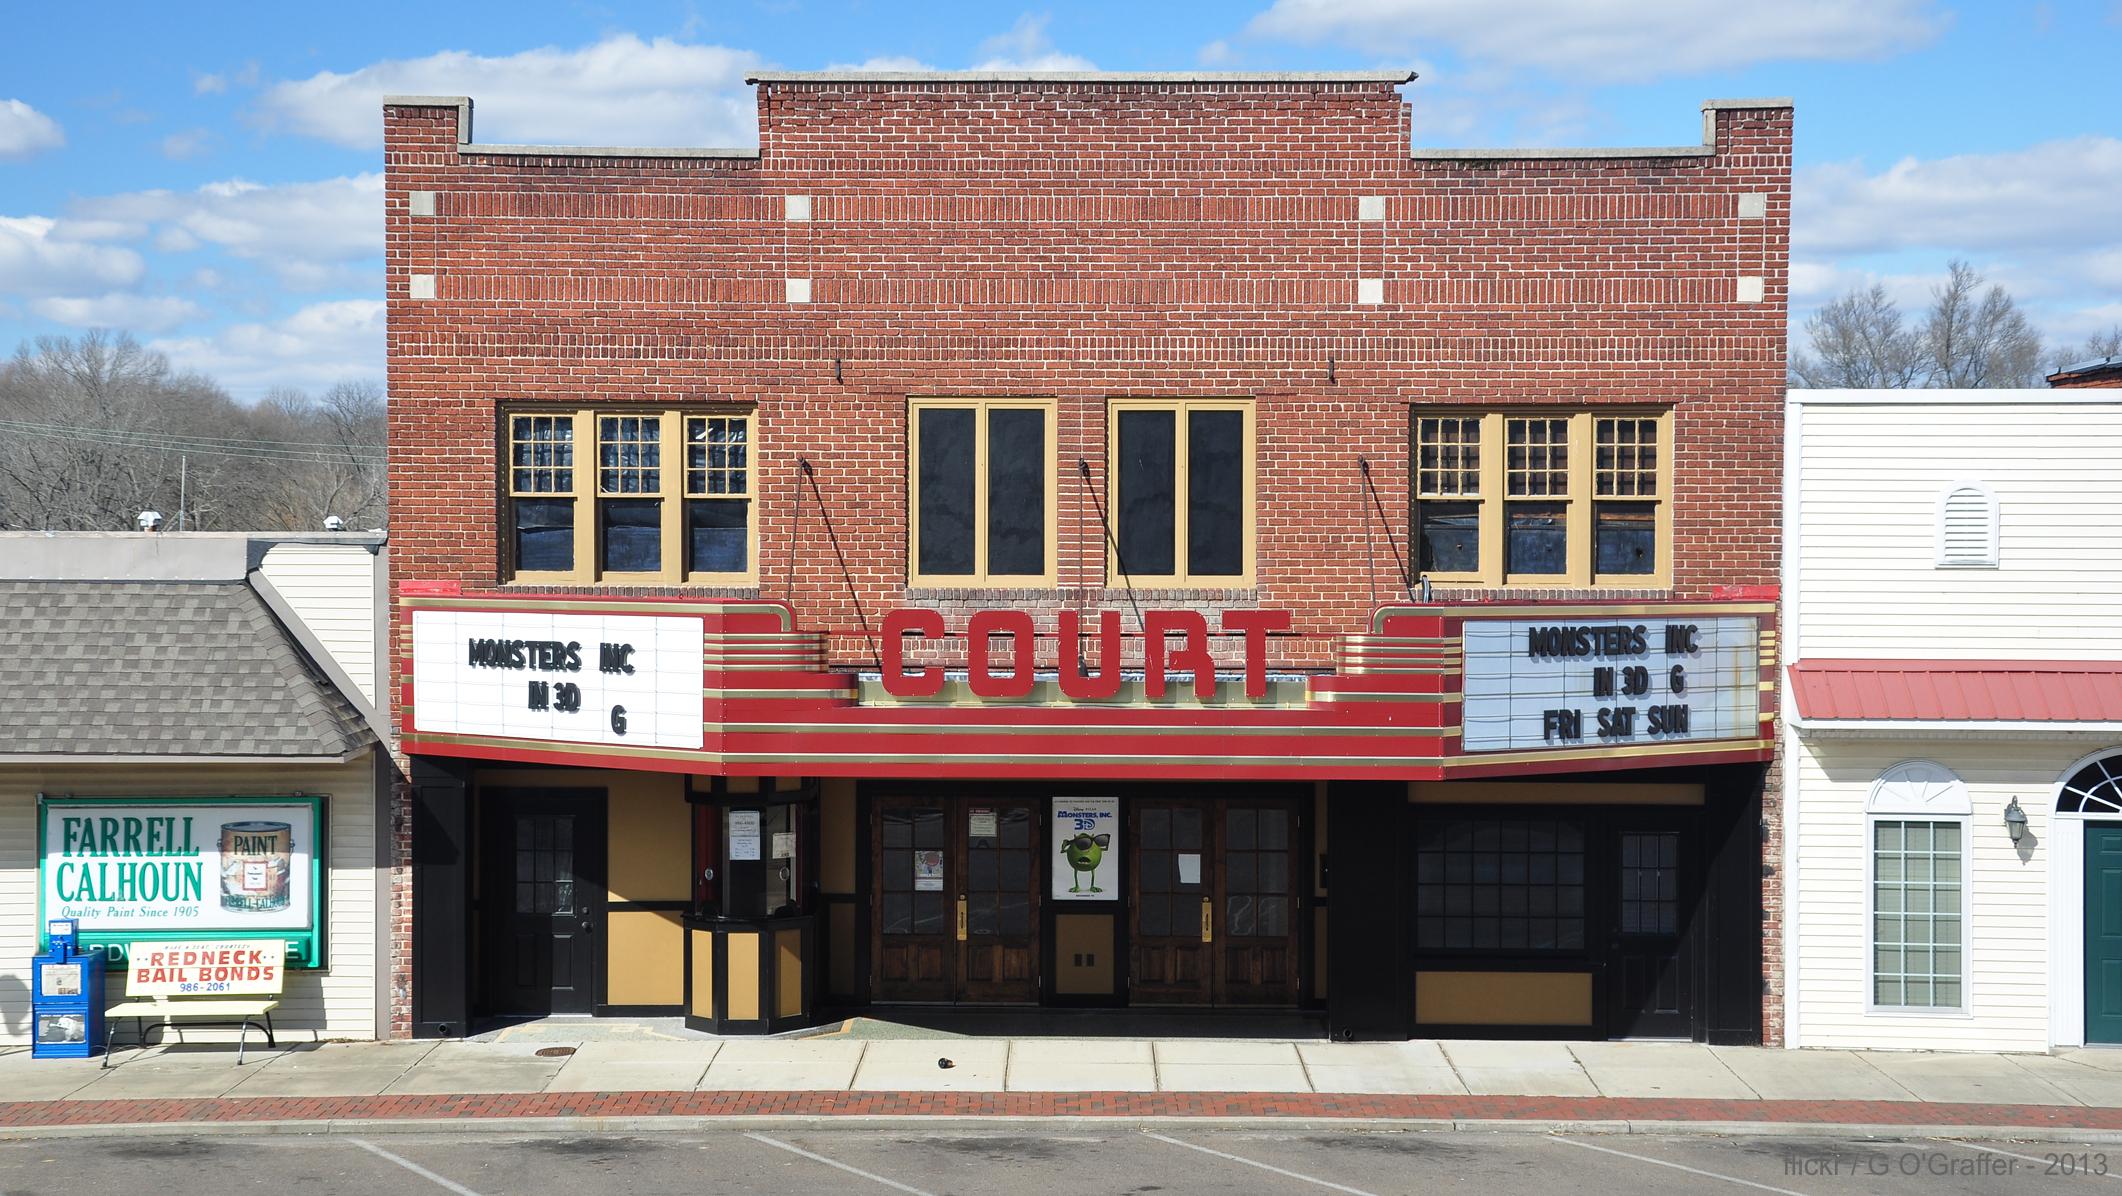 Tennessee carroll county clarksburg - Tennessee Huntingdon Movietheaters Carrollcounty Oldmovietheaters Courttheatre